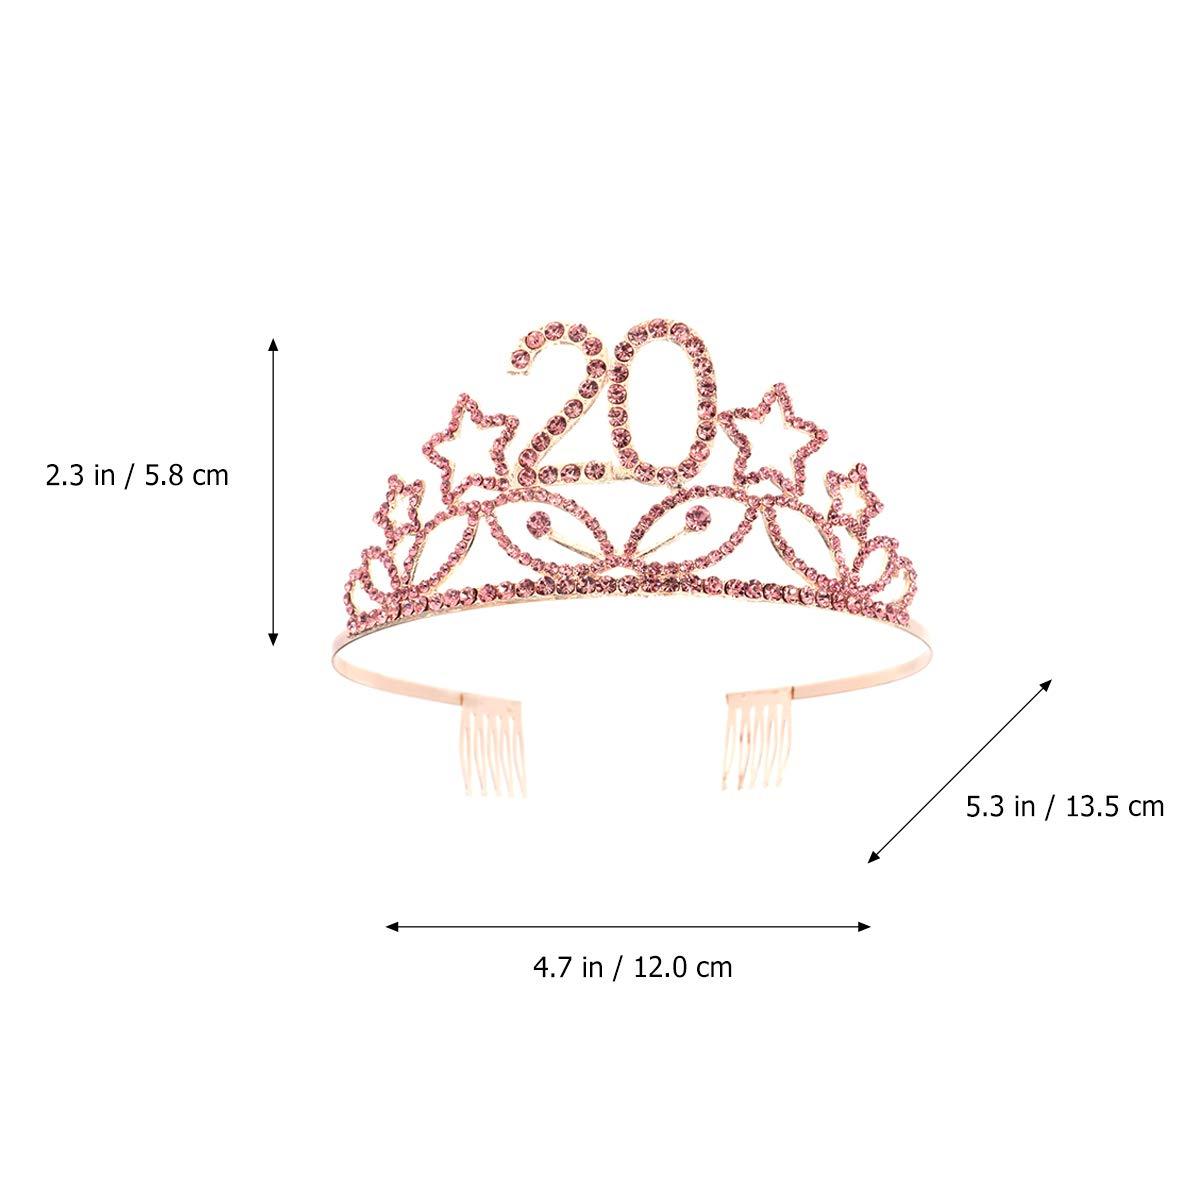 Lurrose Corona Princesa Cumpleaños 20 Años Diadema ...